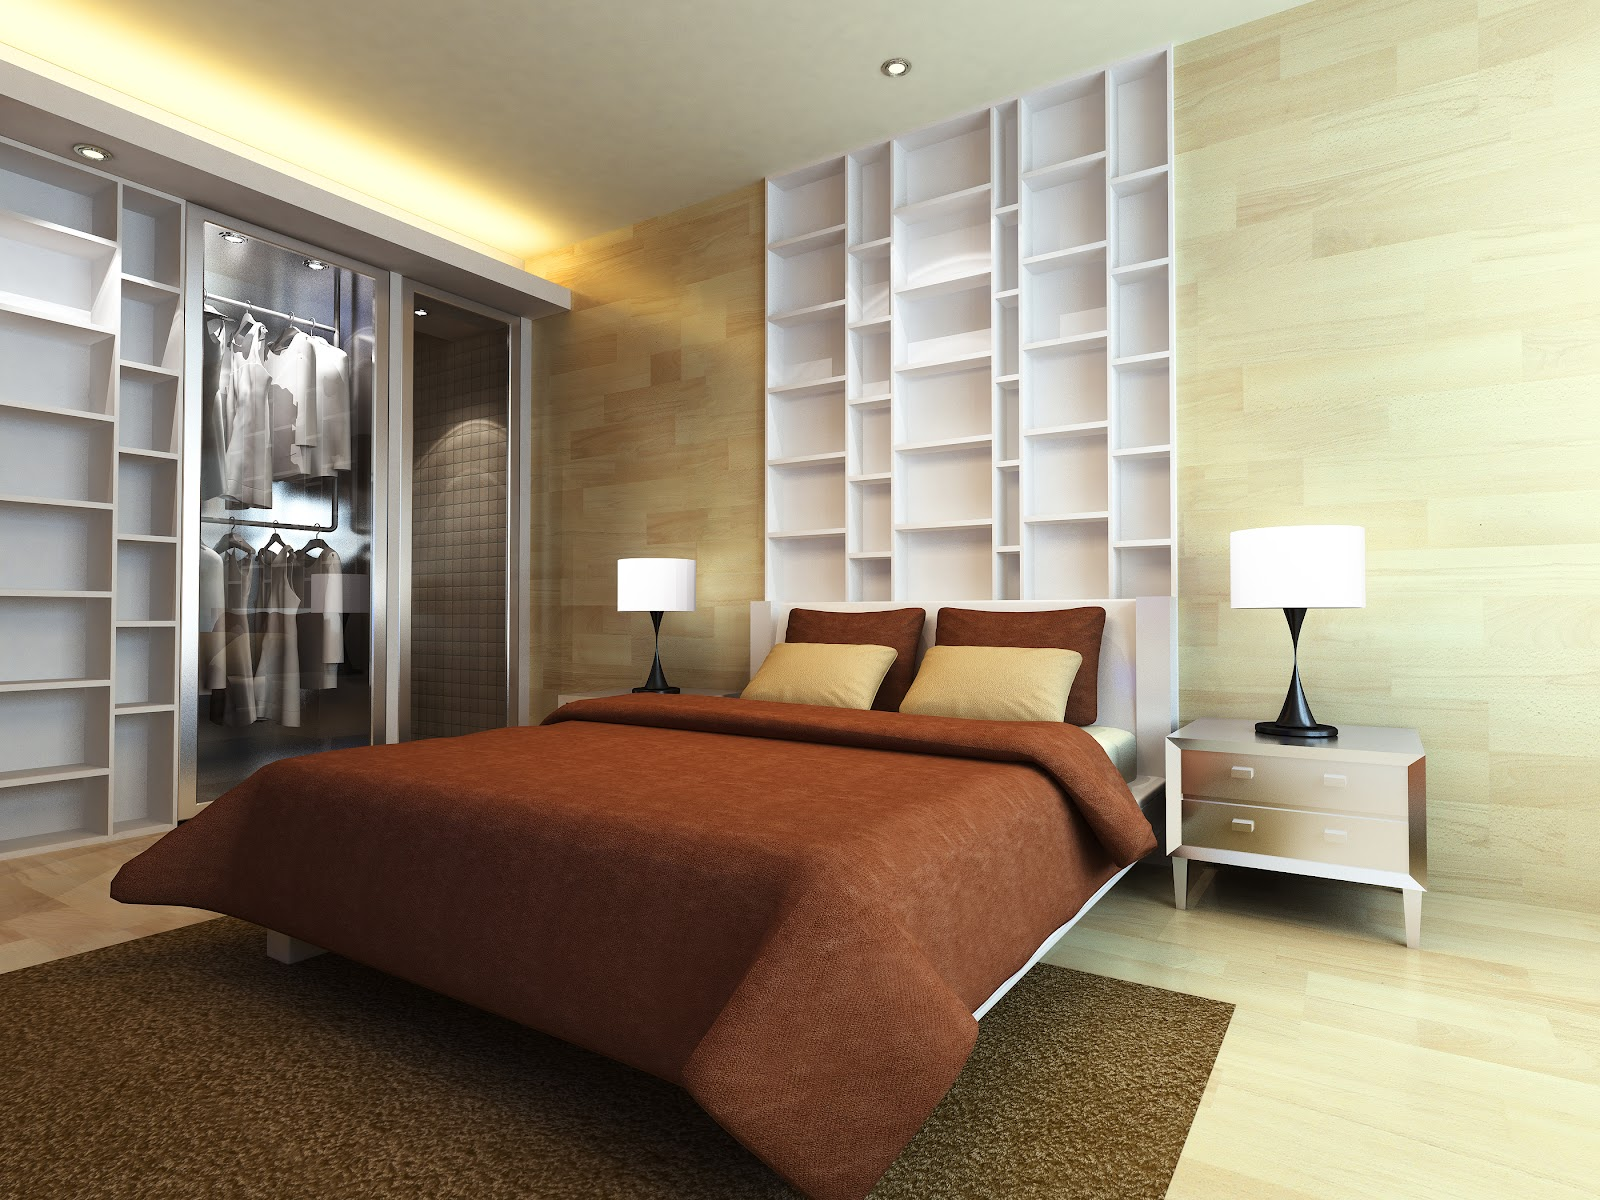 bigstock-Modern-bedroom-21412919.jpg